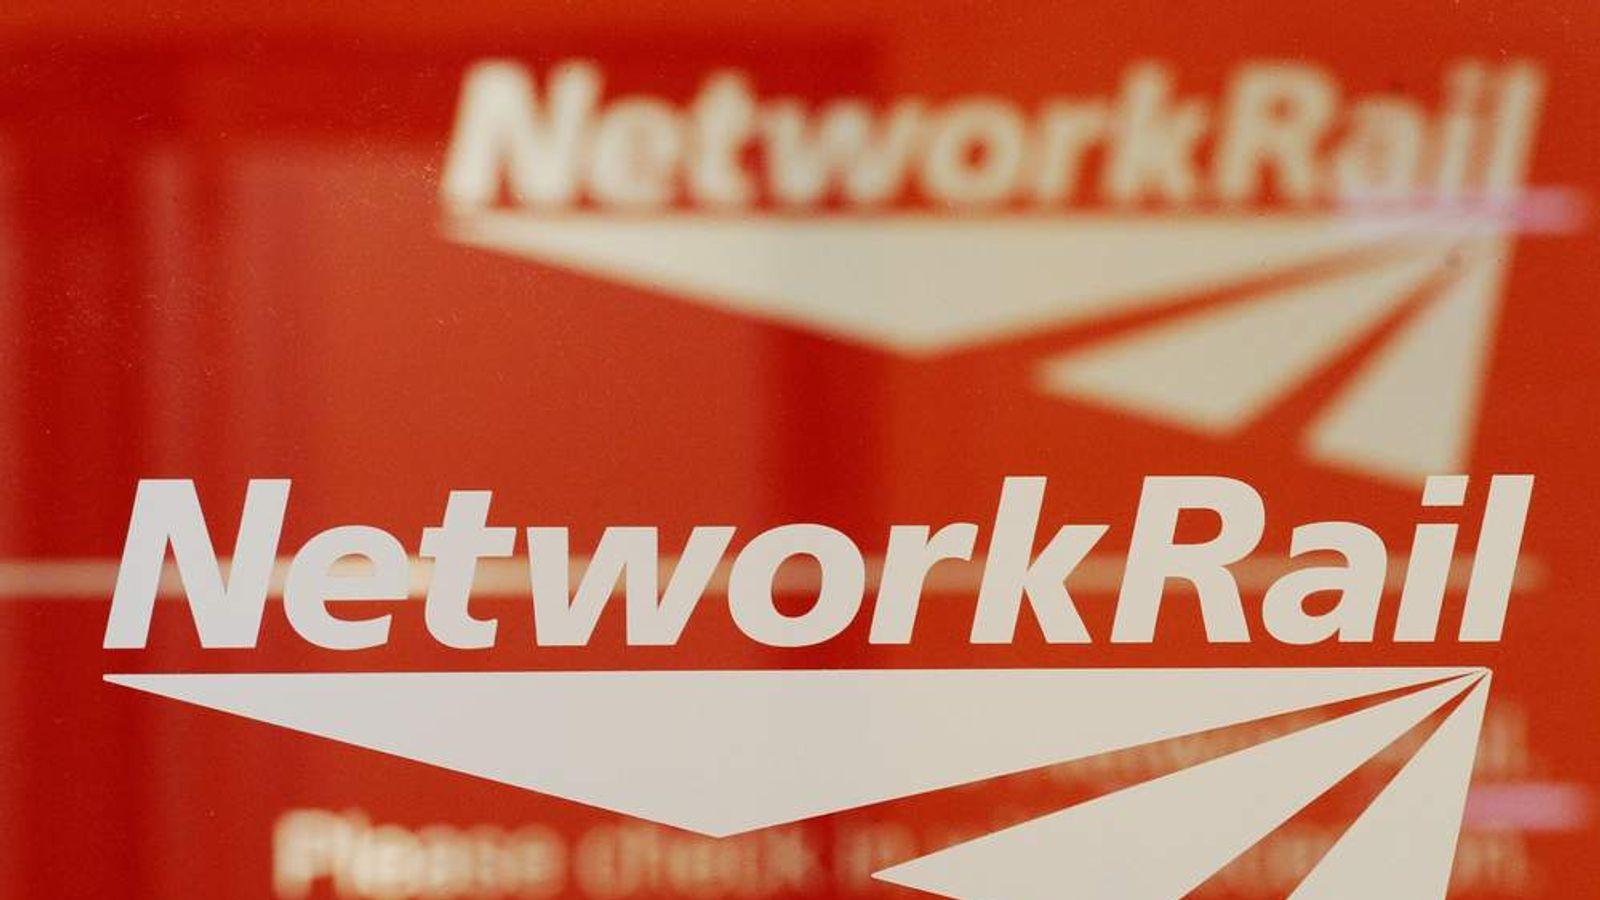 Four Network Rail bosses paid £600,000 in bonuses